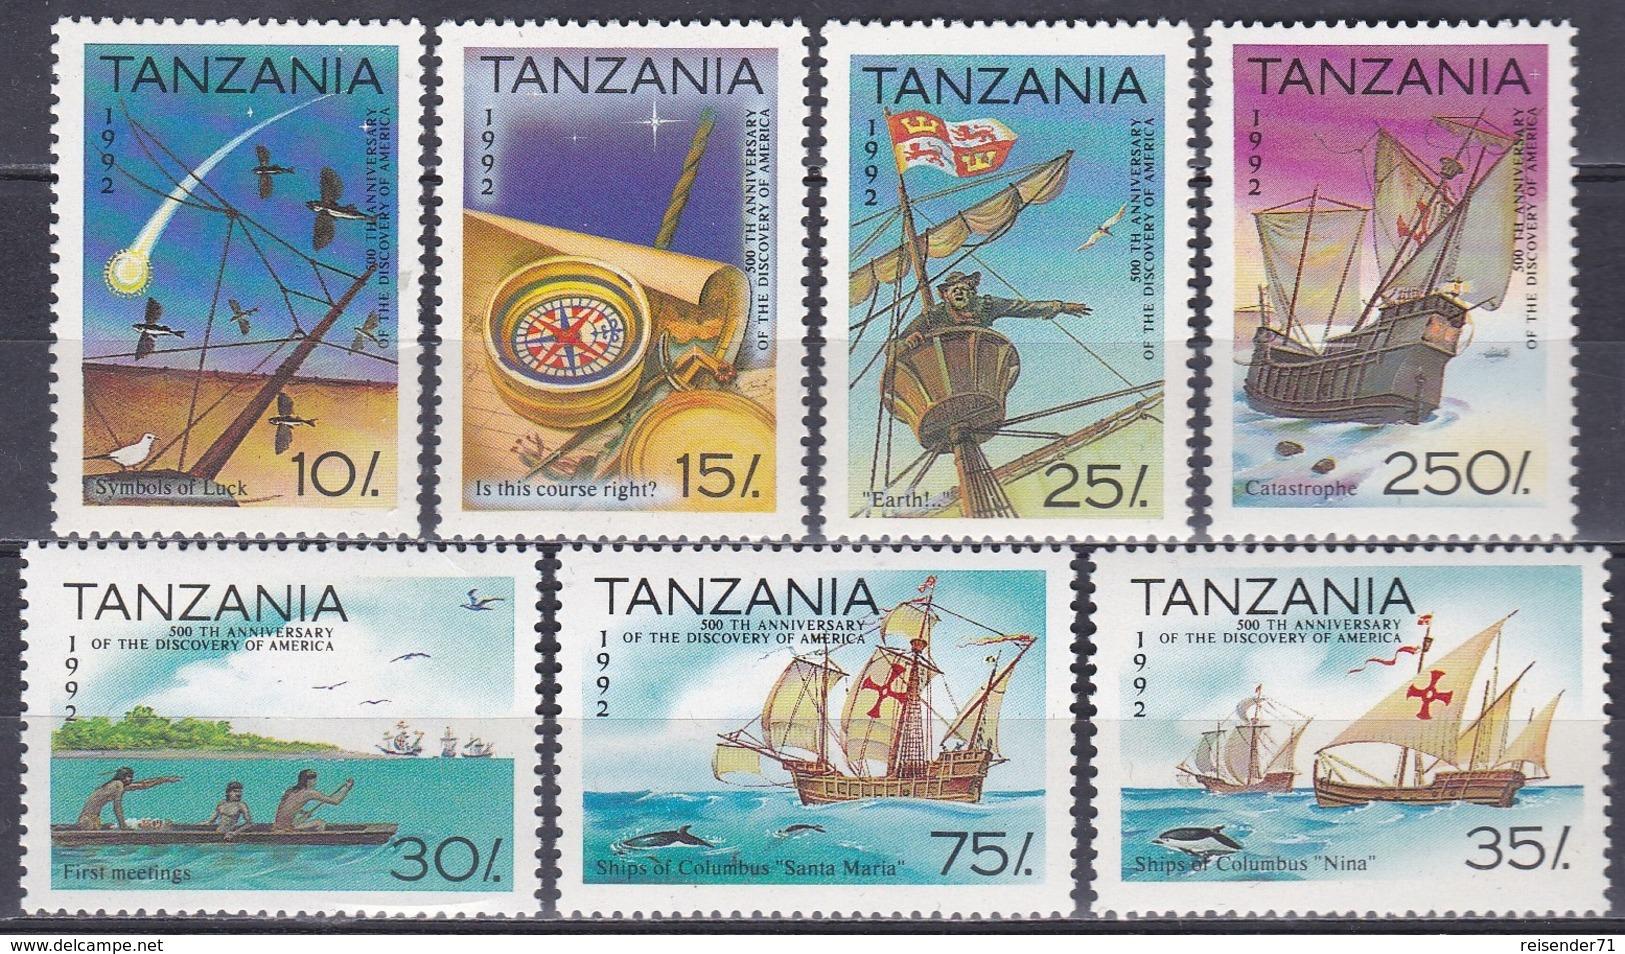 Tansania Tanzania 1992 Geschichte History Entdeckungen Discovery Kolumbus Columbus Schiffe Ships Kompass, Mi. 1298-4 ** - Tansania (1964-...)